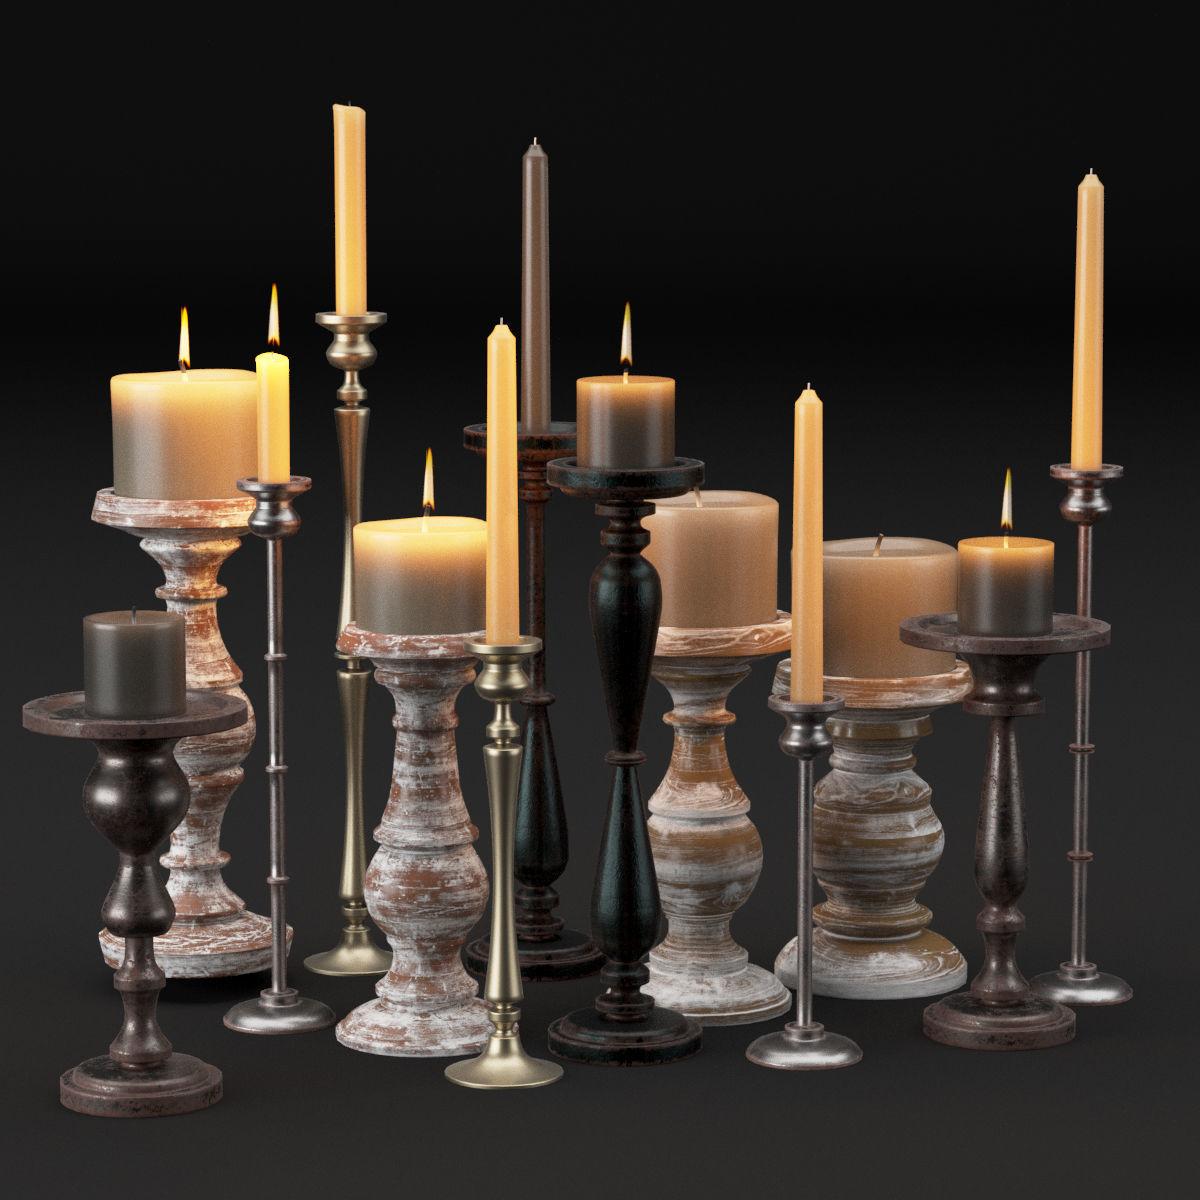 candlestick full set